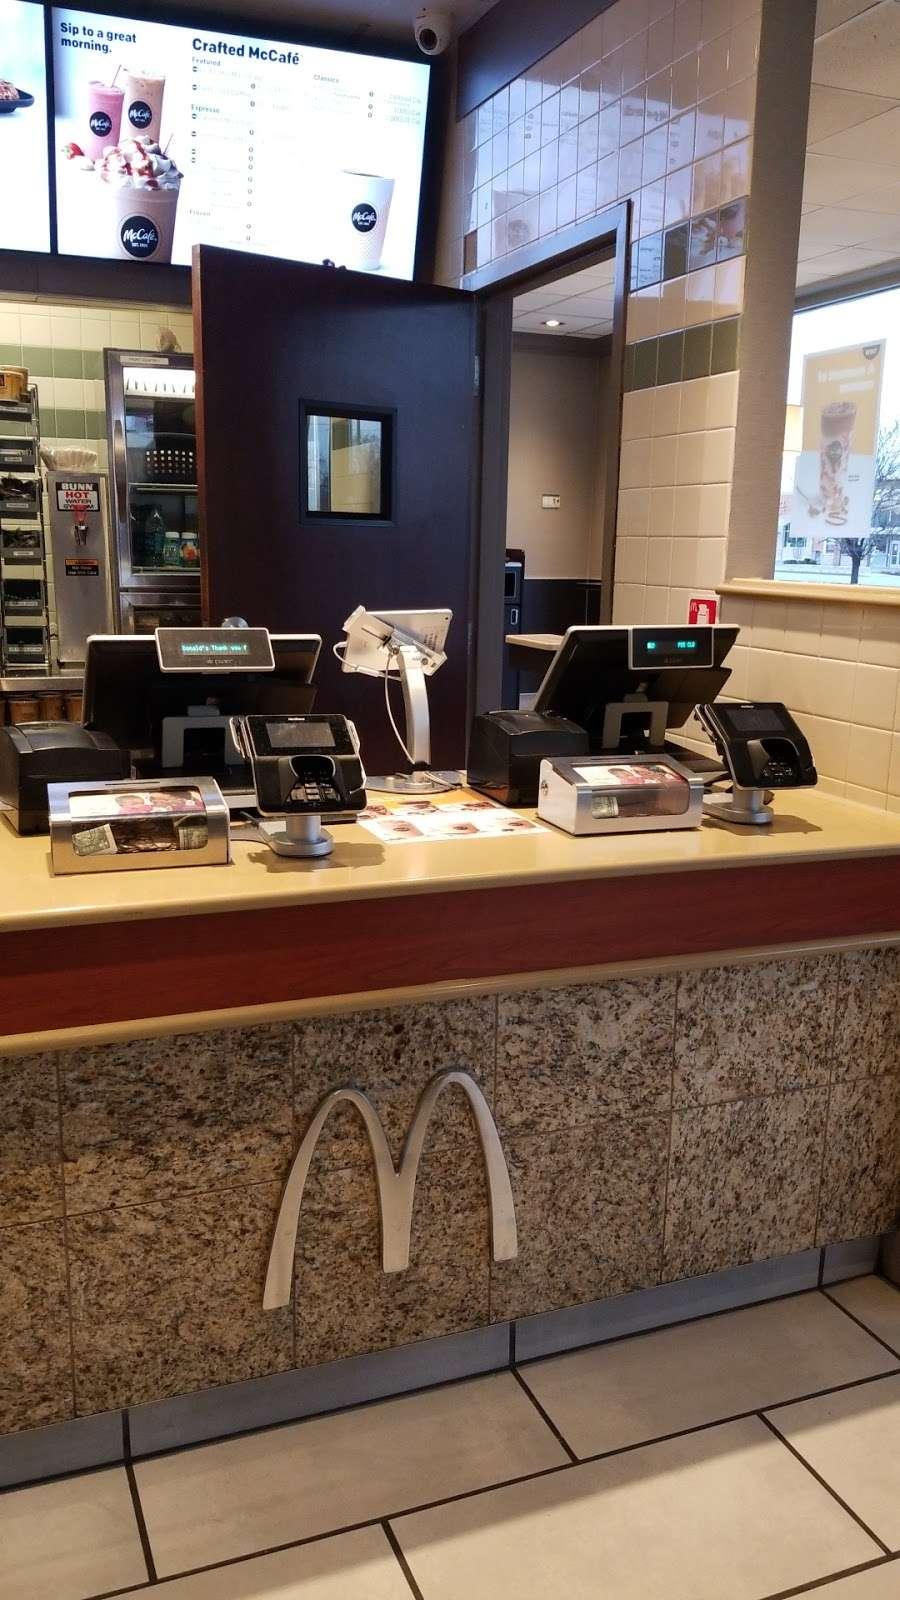 McDonalds - cafe  | Photo 4 of 10 | Address: 6034 W 95th St, Oak Lawn, IL 60453, USA | Phone: (708) 430-6934